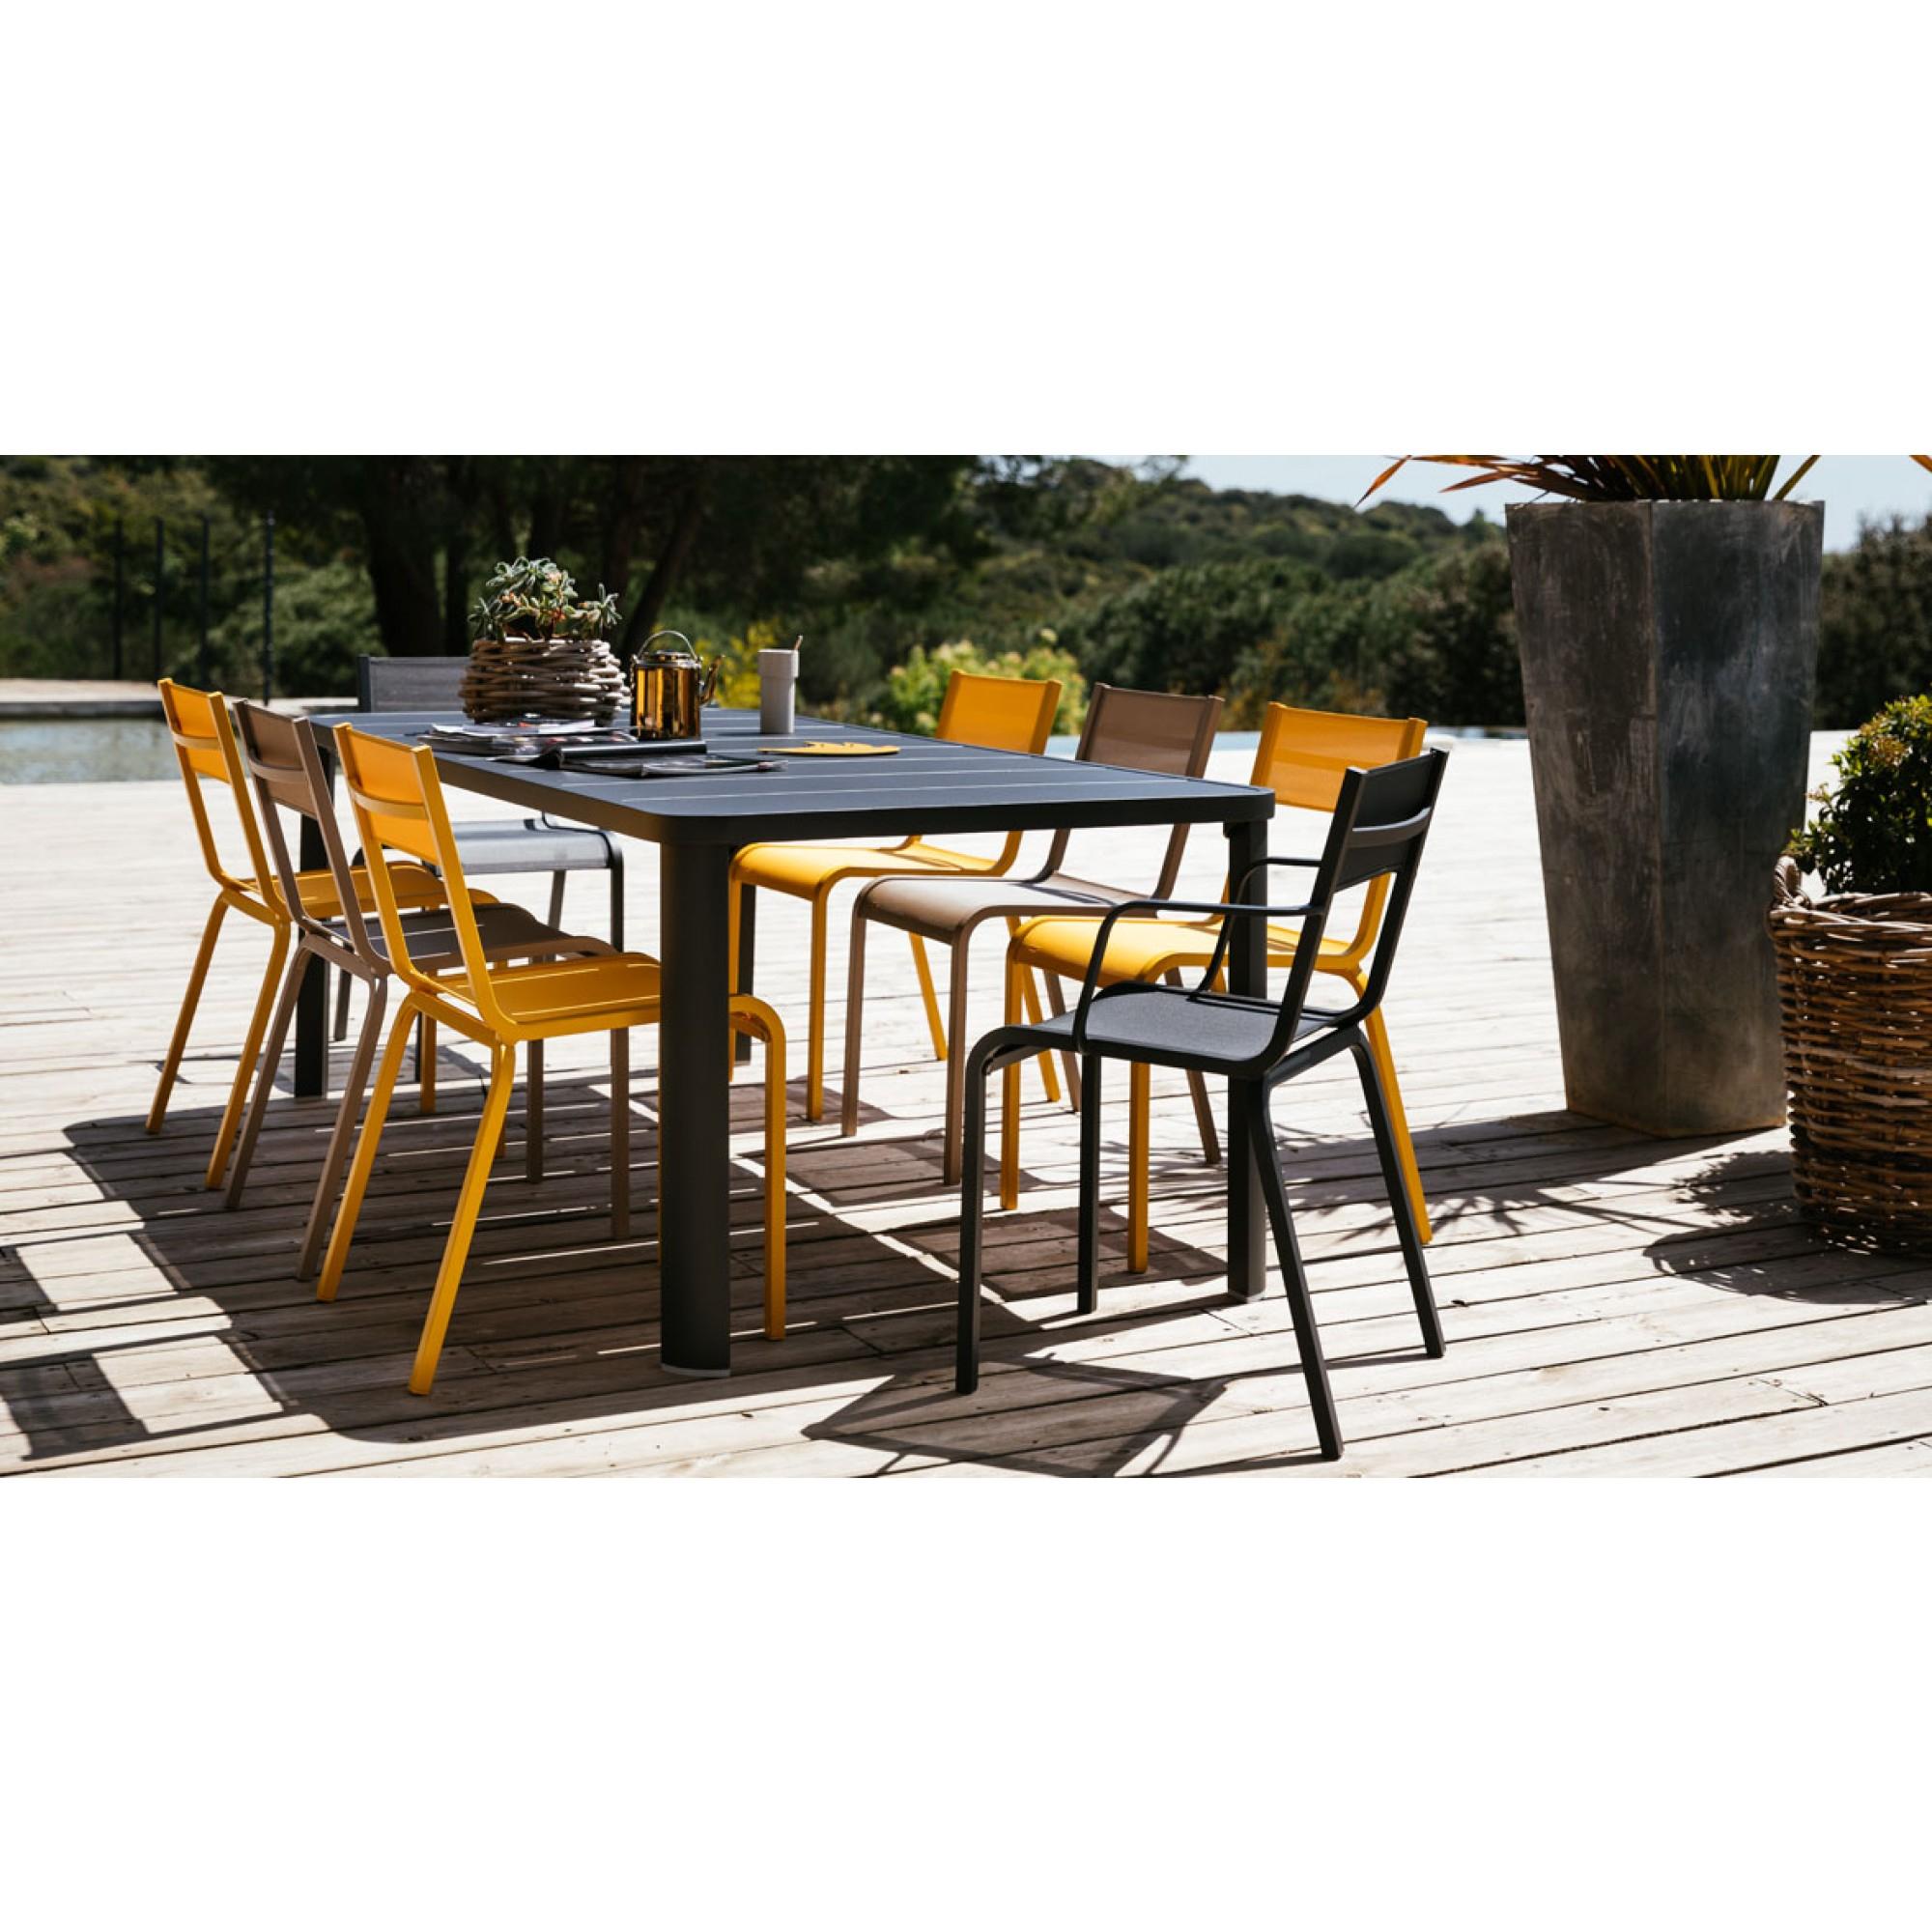 Oleron | Fixed Tables | Tables | Fermob - Masonionline concernant Table De Jardin Discount